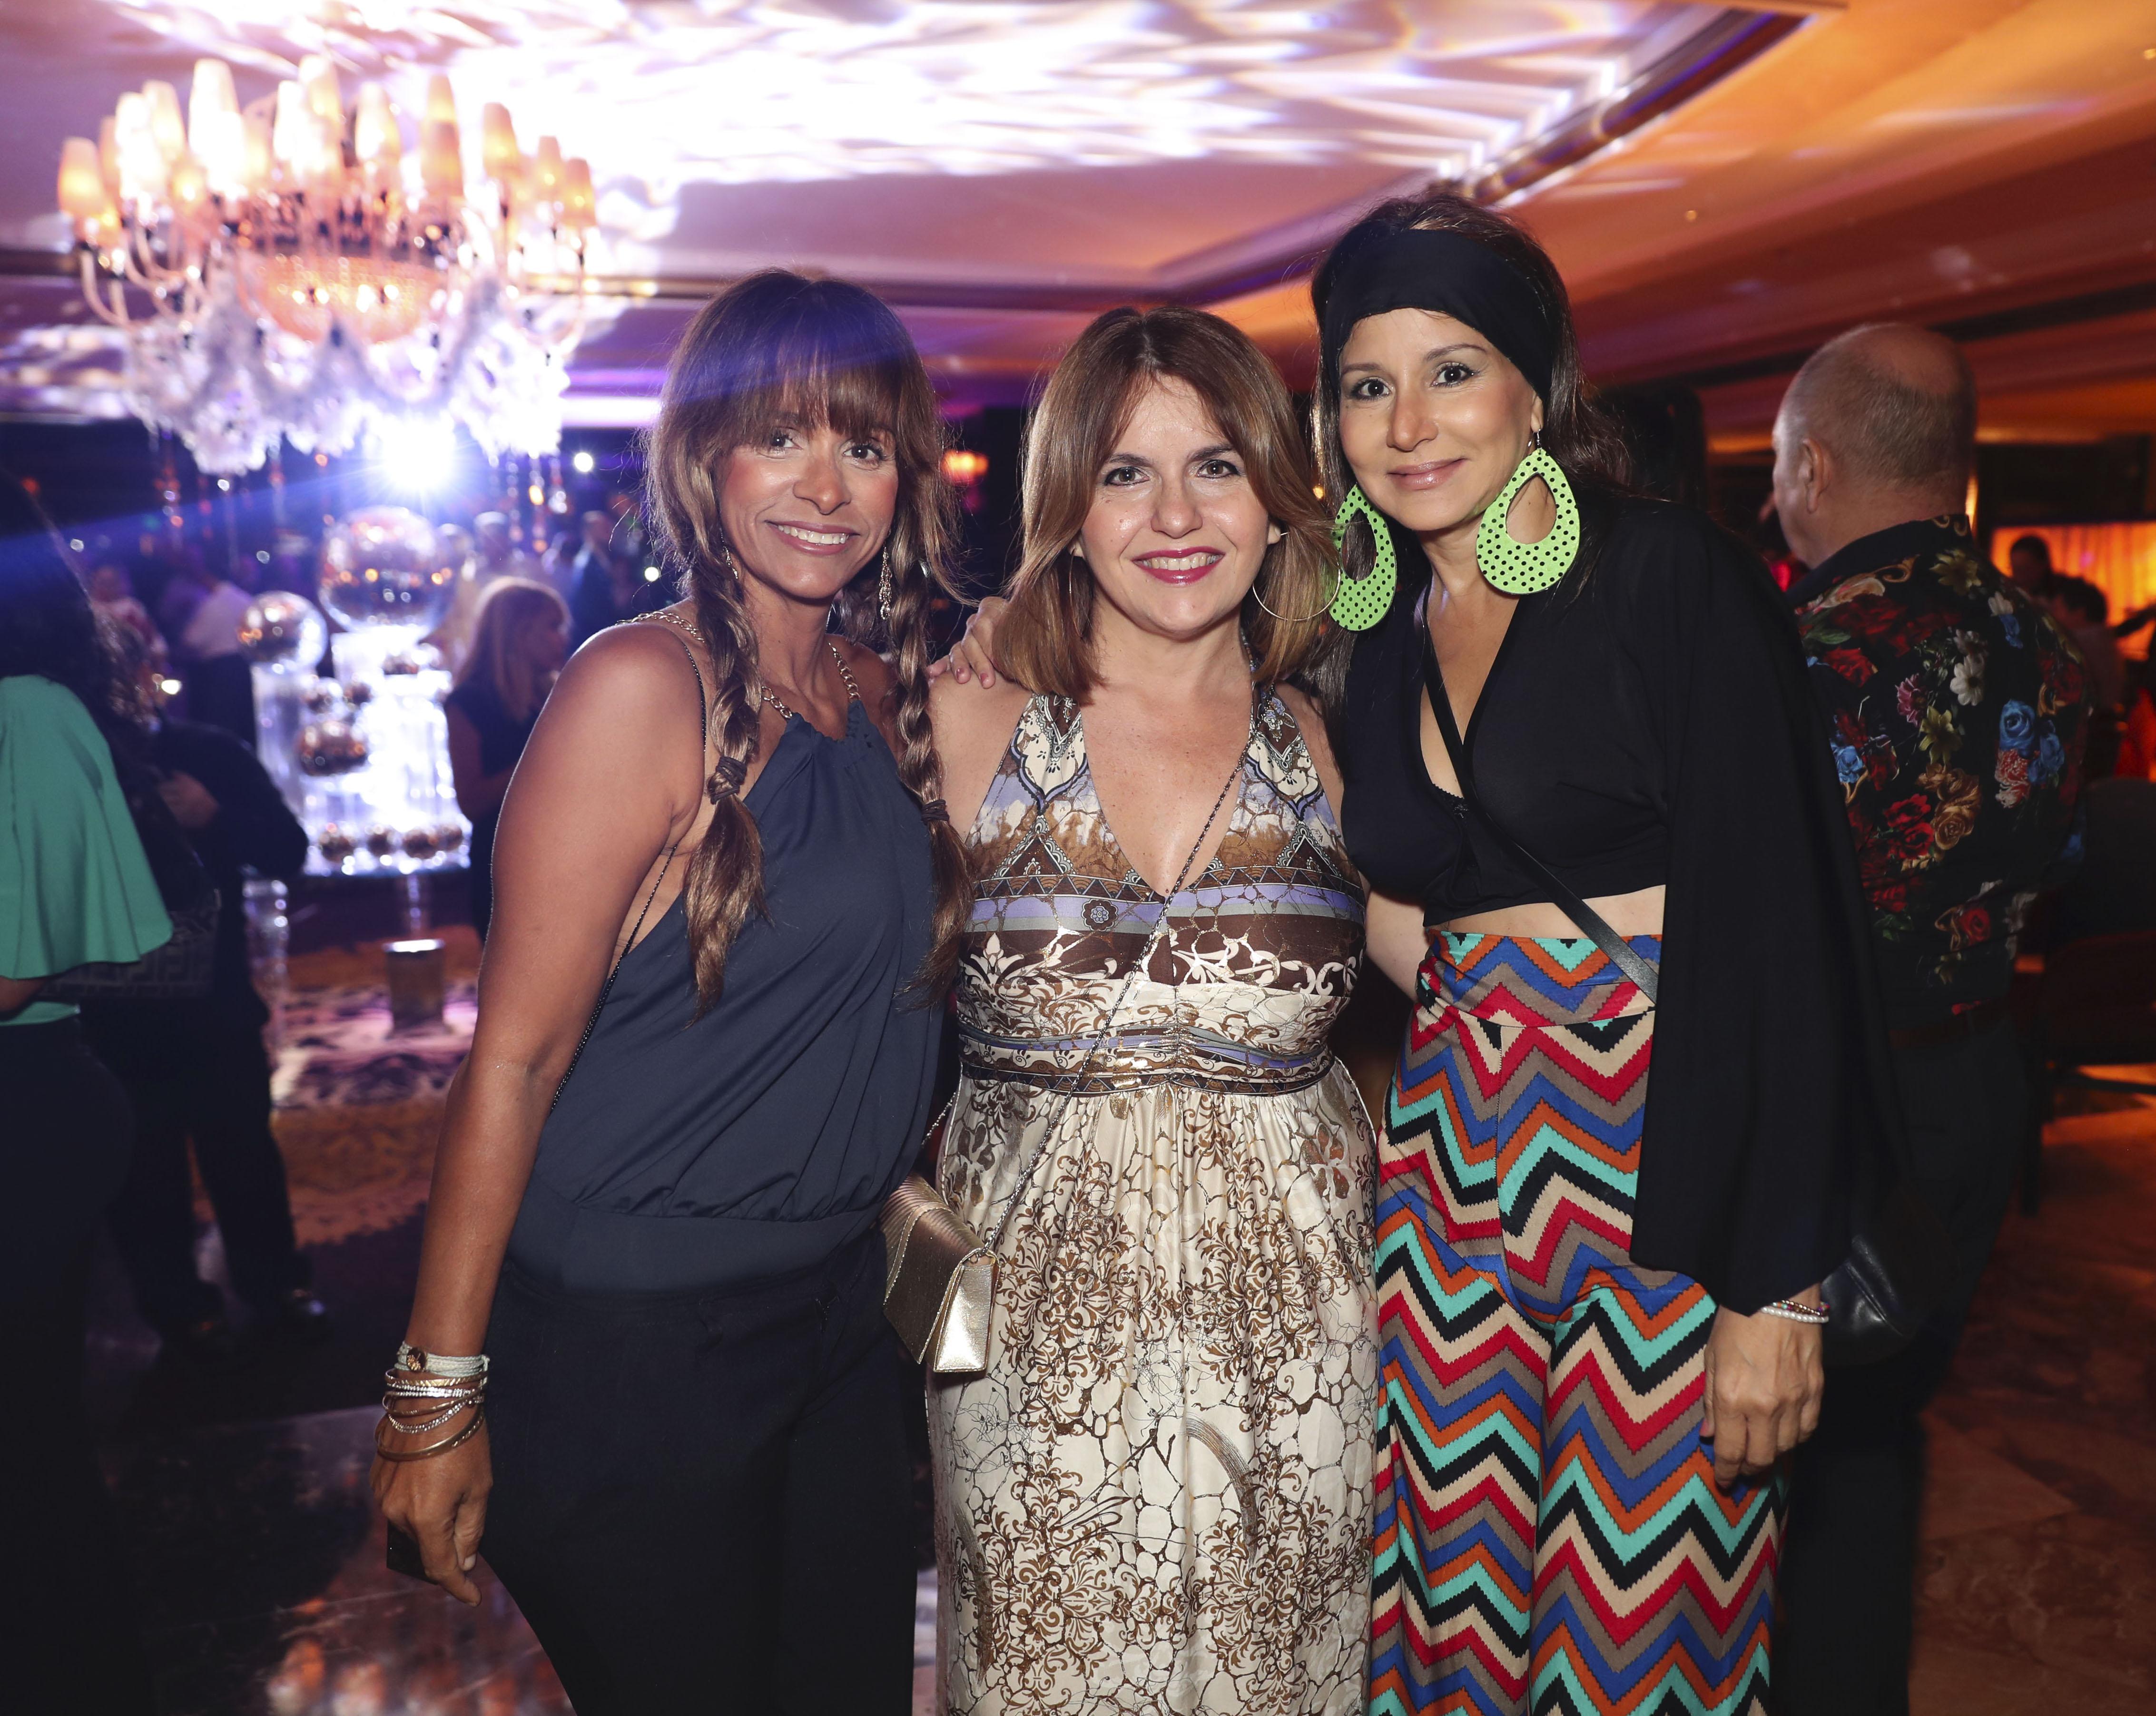 Gisselle Sáez, Diana Cordero y Silvia Torres. (Suministrada)